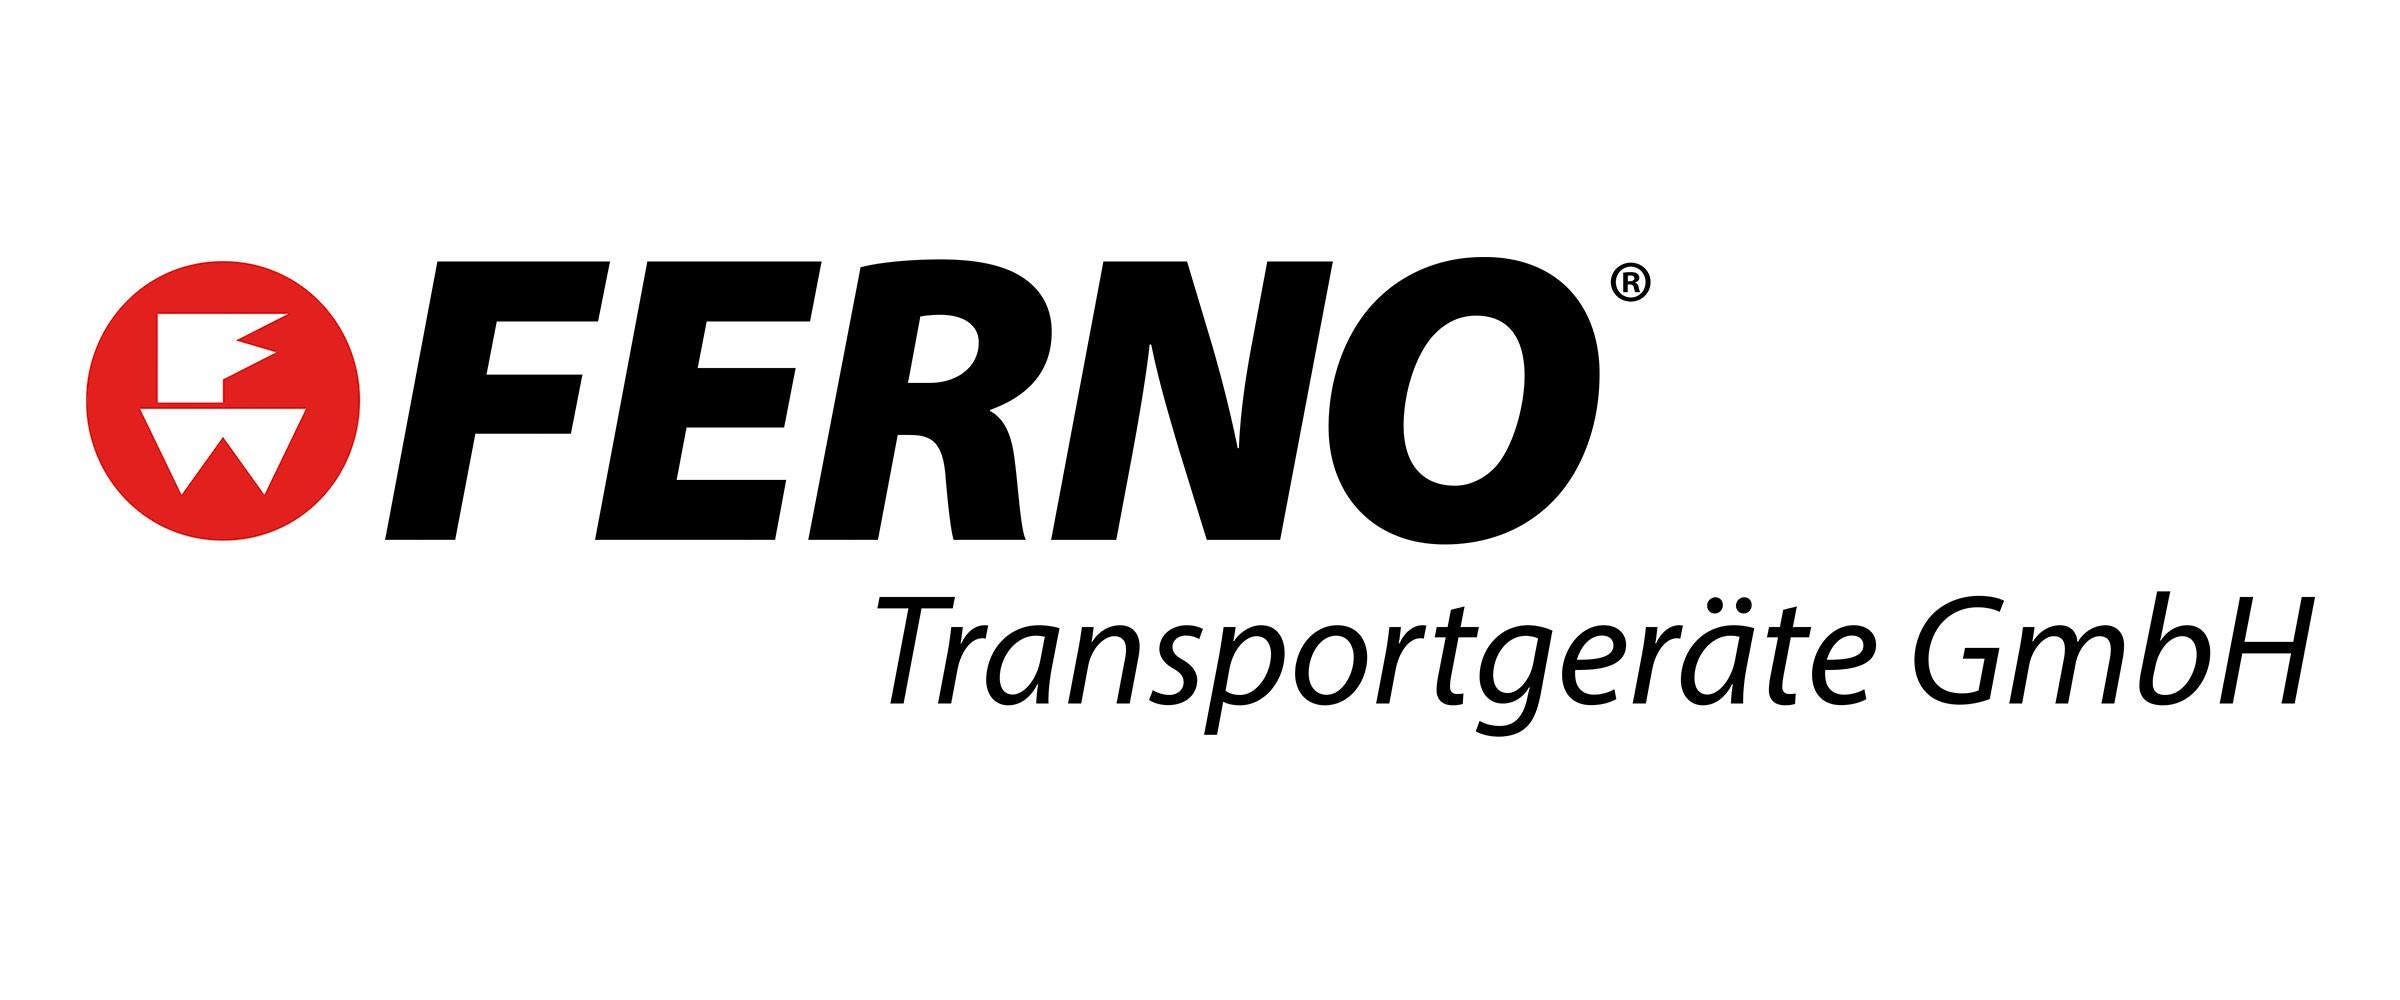 FERNO Transportgeräte GmbH